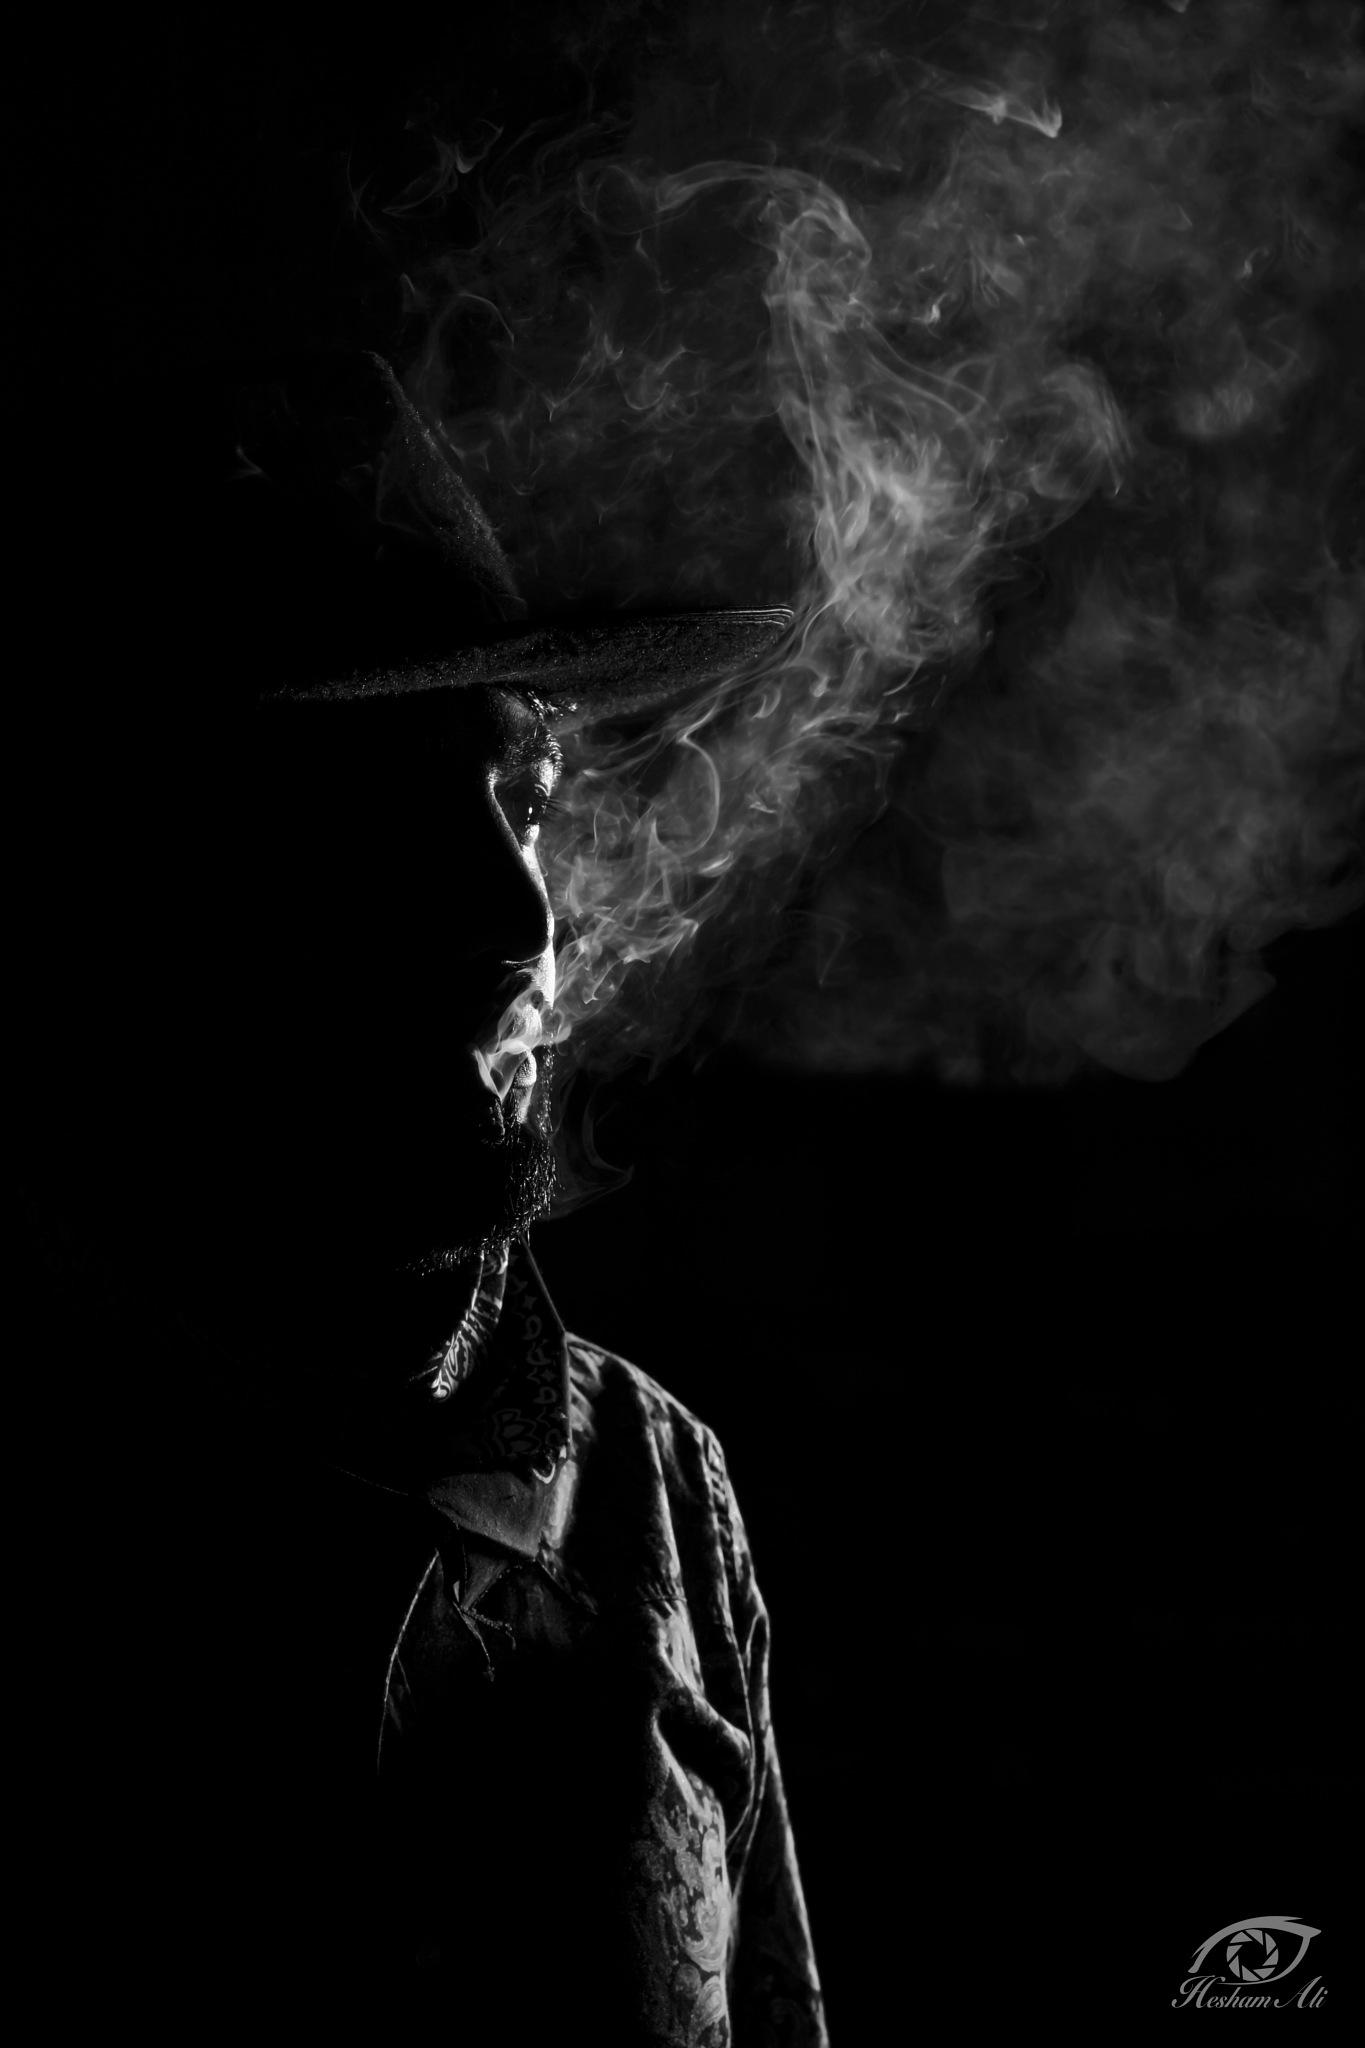 THE SMOKE  by SoloTango